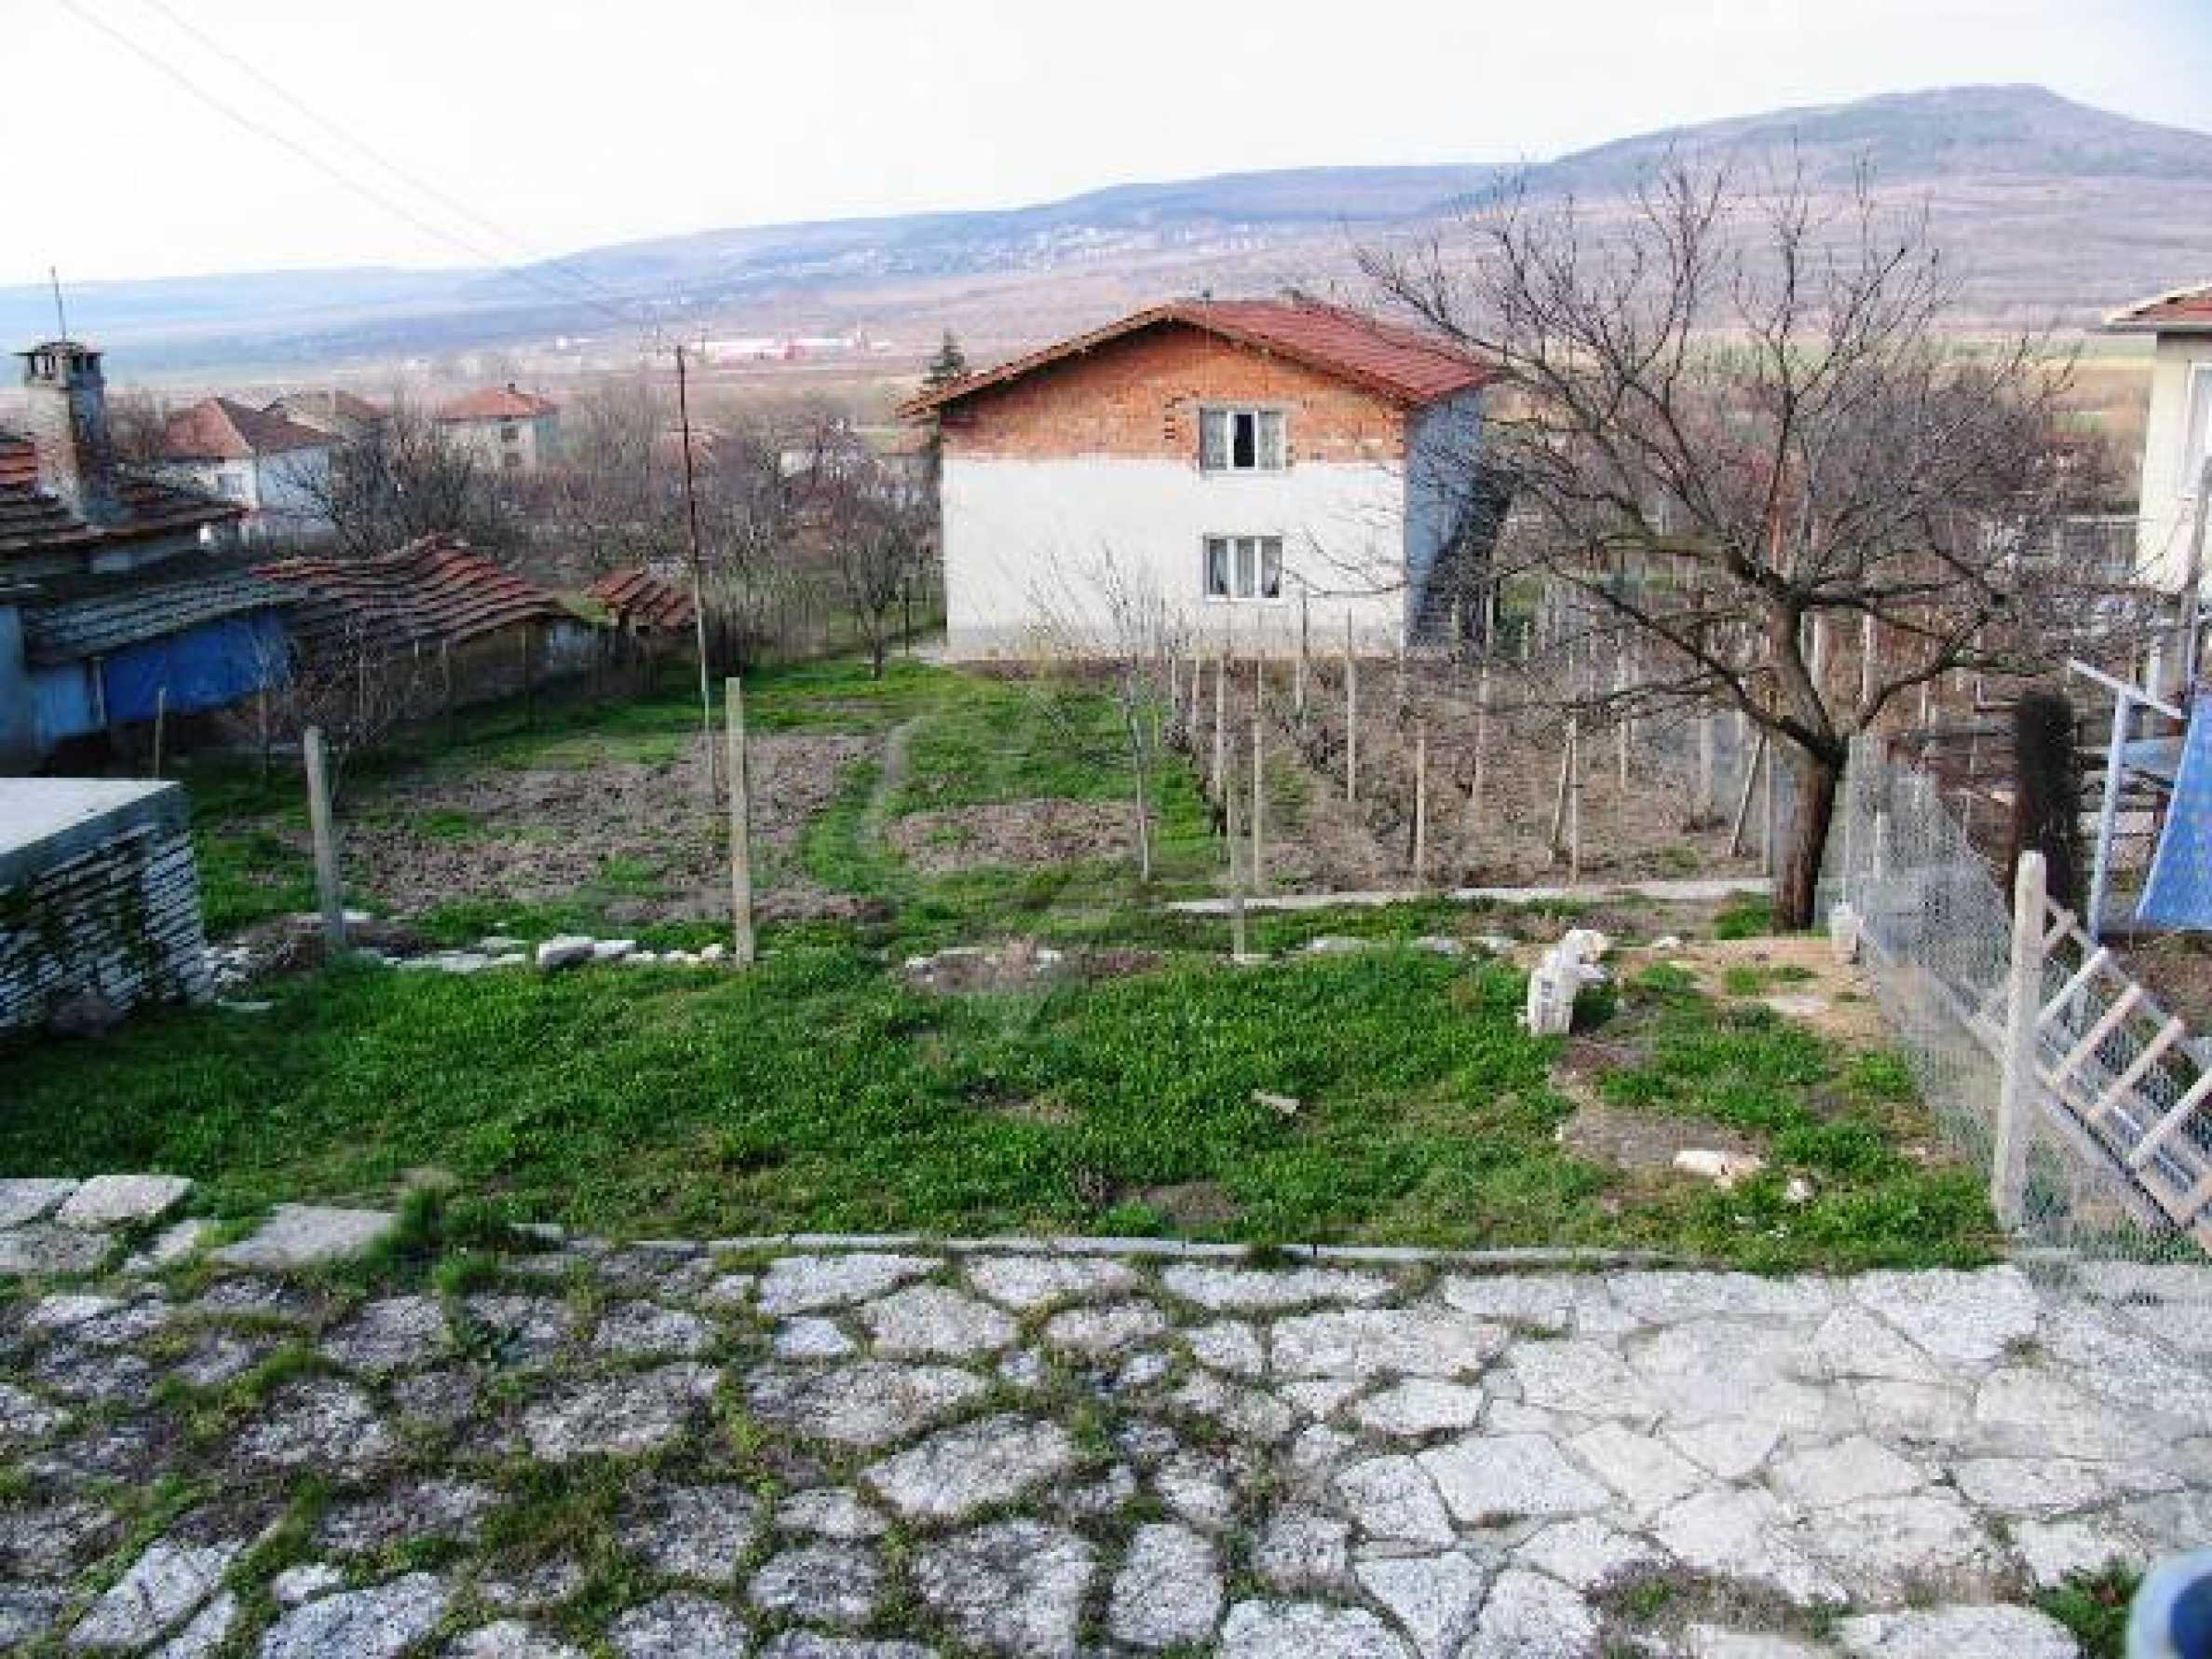 Land in Obrochishte Village, just 3km from Albena Resort  15